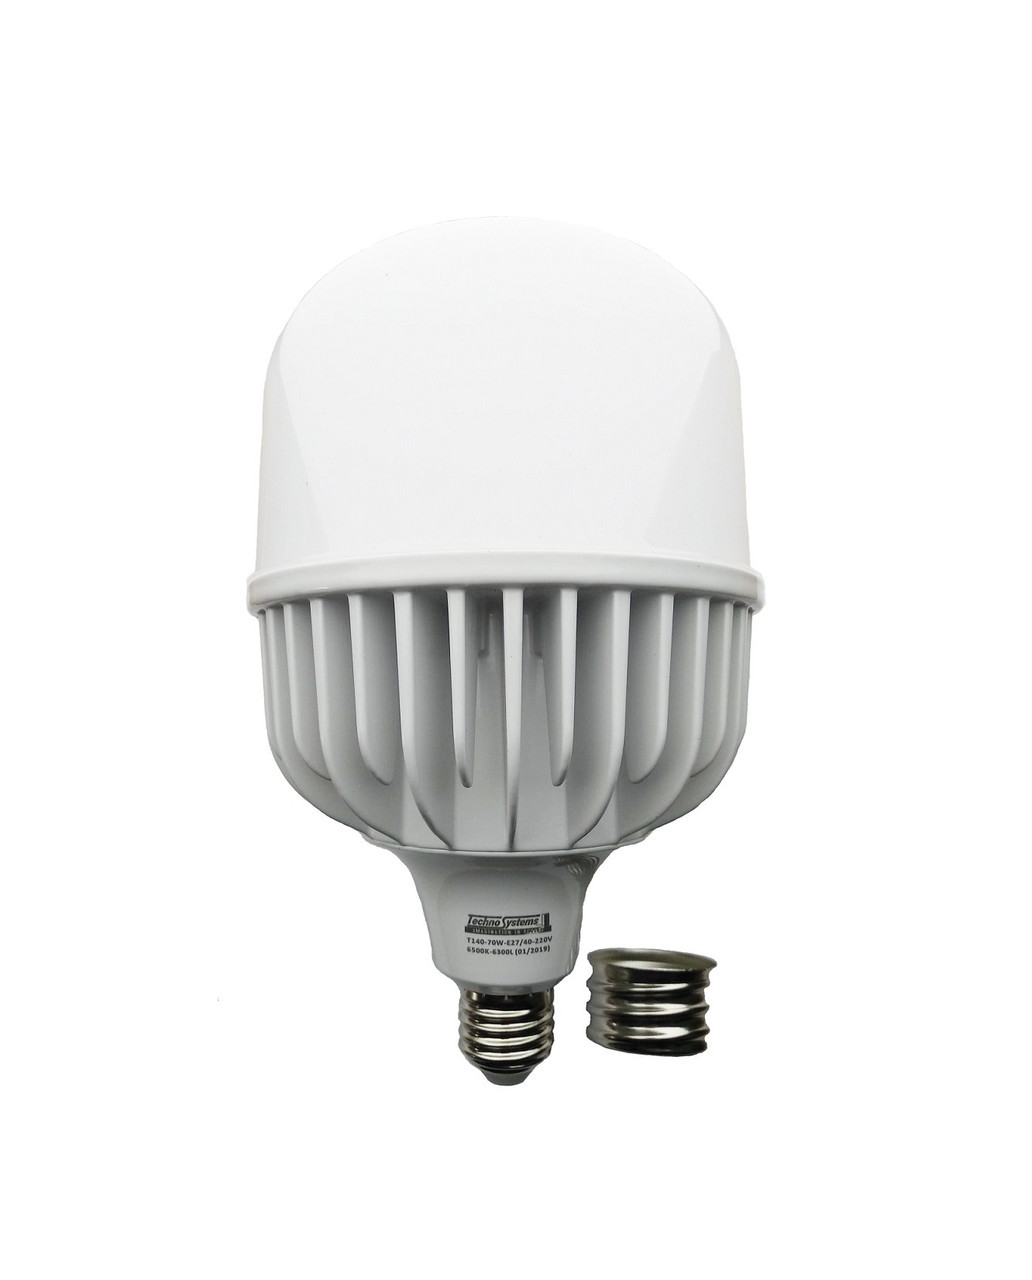 Лампа світлодіодна LED Bulb T160 70W E27 E40 6500K 220V 6300L Alum ICCD TechnoSystems TNSy5000108